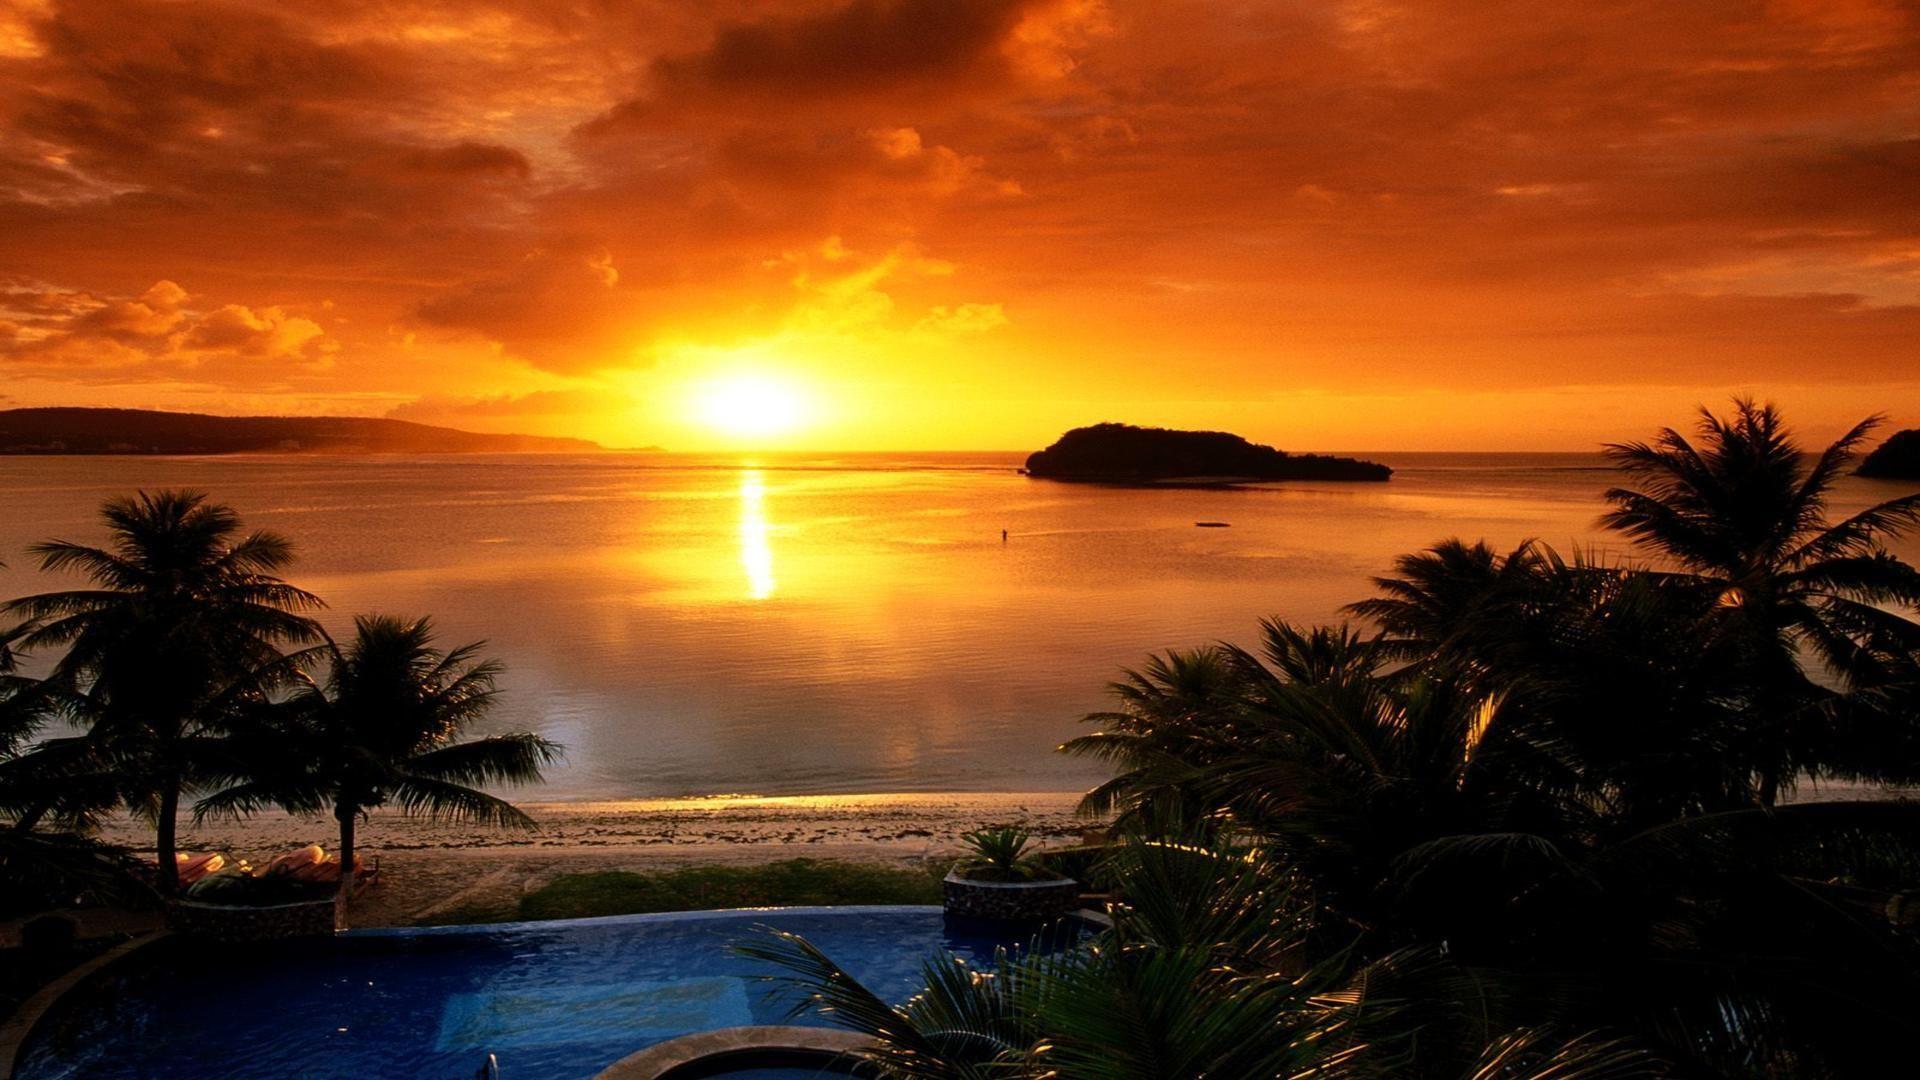 Agana bay at sunset tamuning Guam scenic free desktop